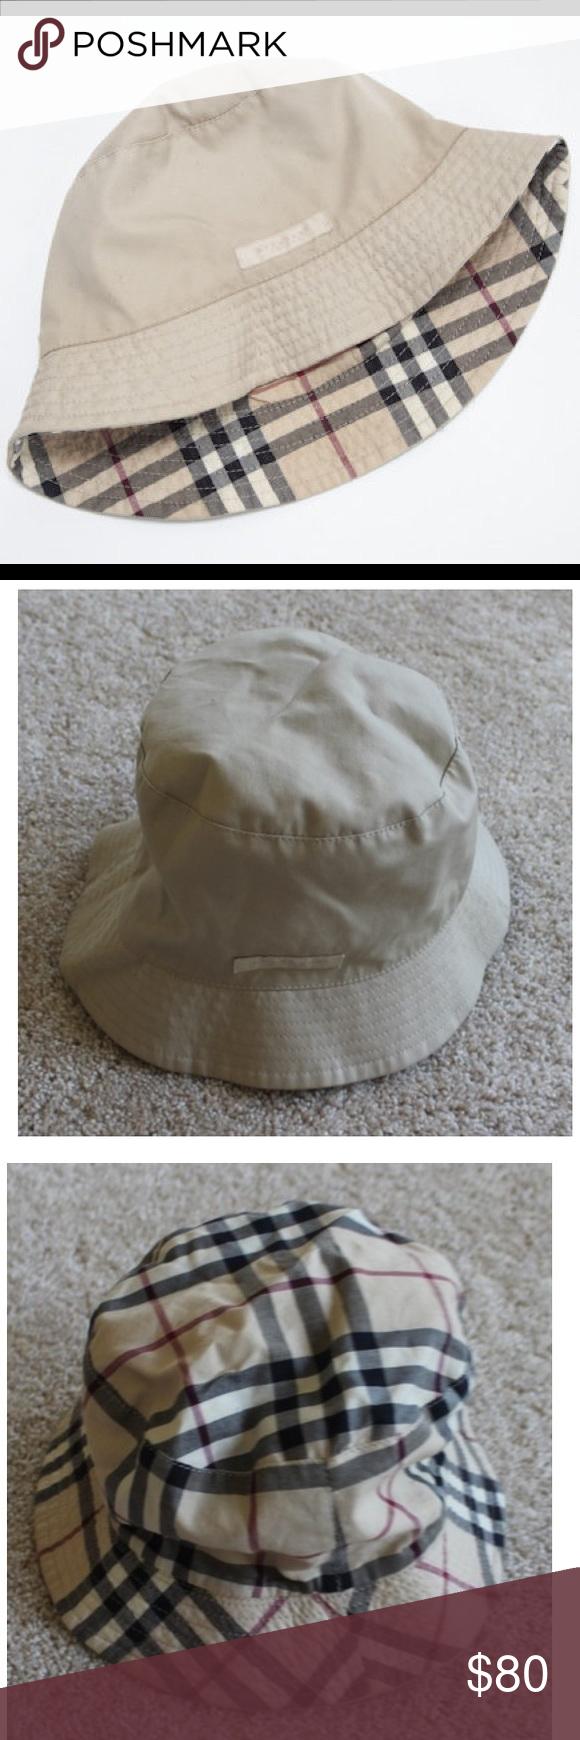 490c6ea7956 Burberry hat - reversible. Burberry hat - reversible! Tan and multicolor  canvas Burberry Reversible bucket ...